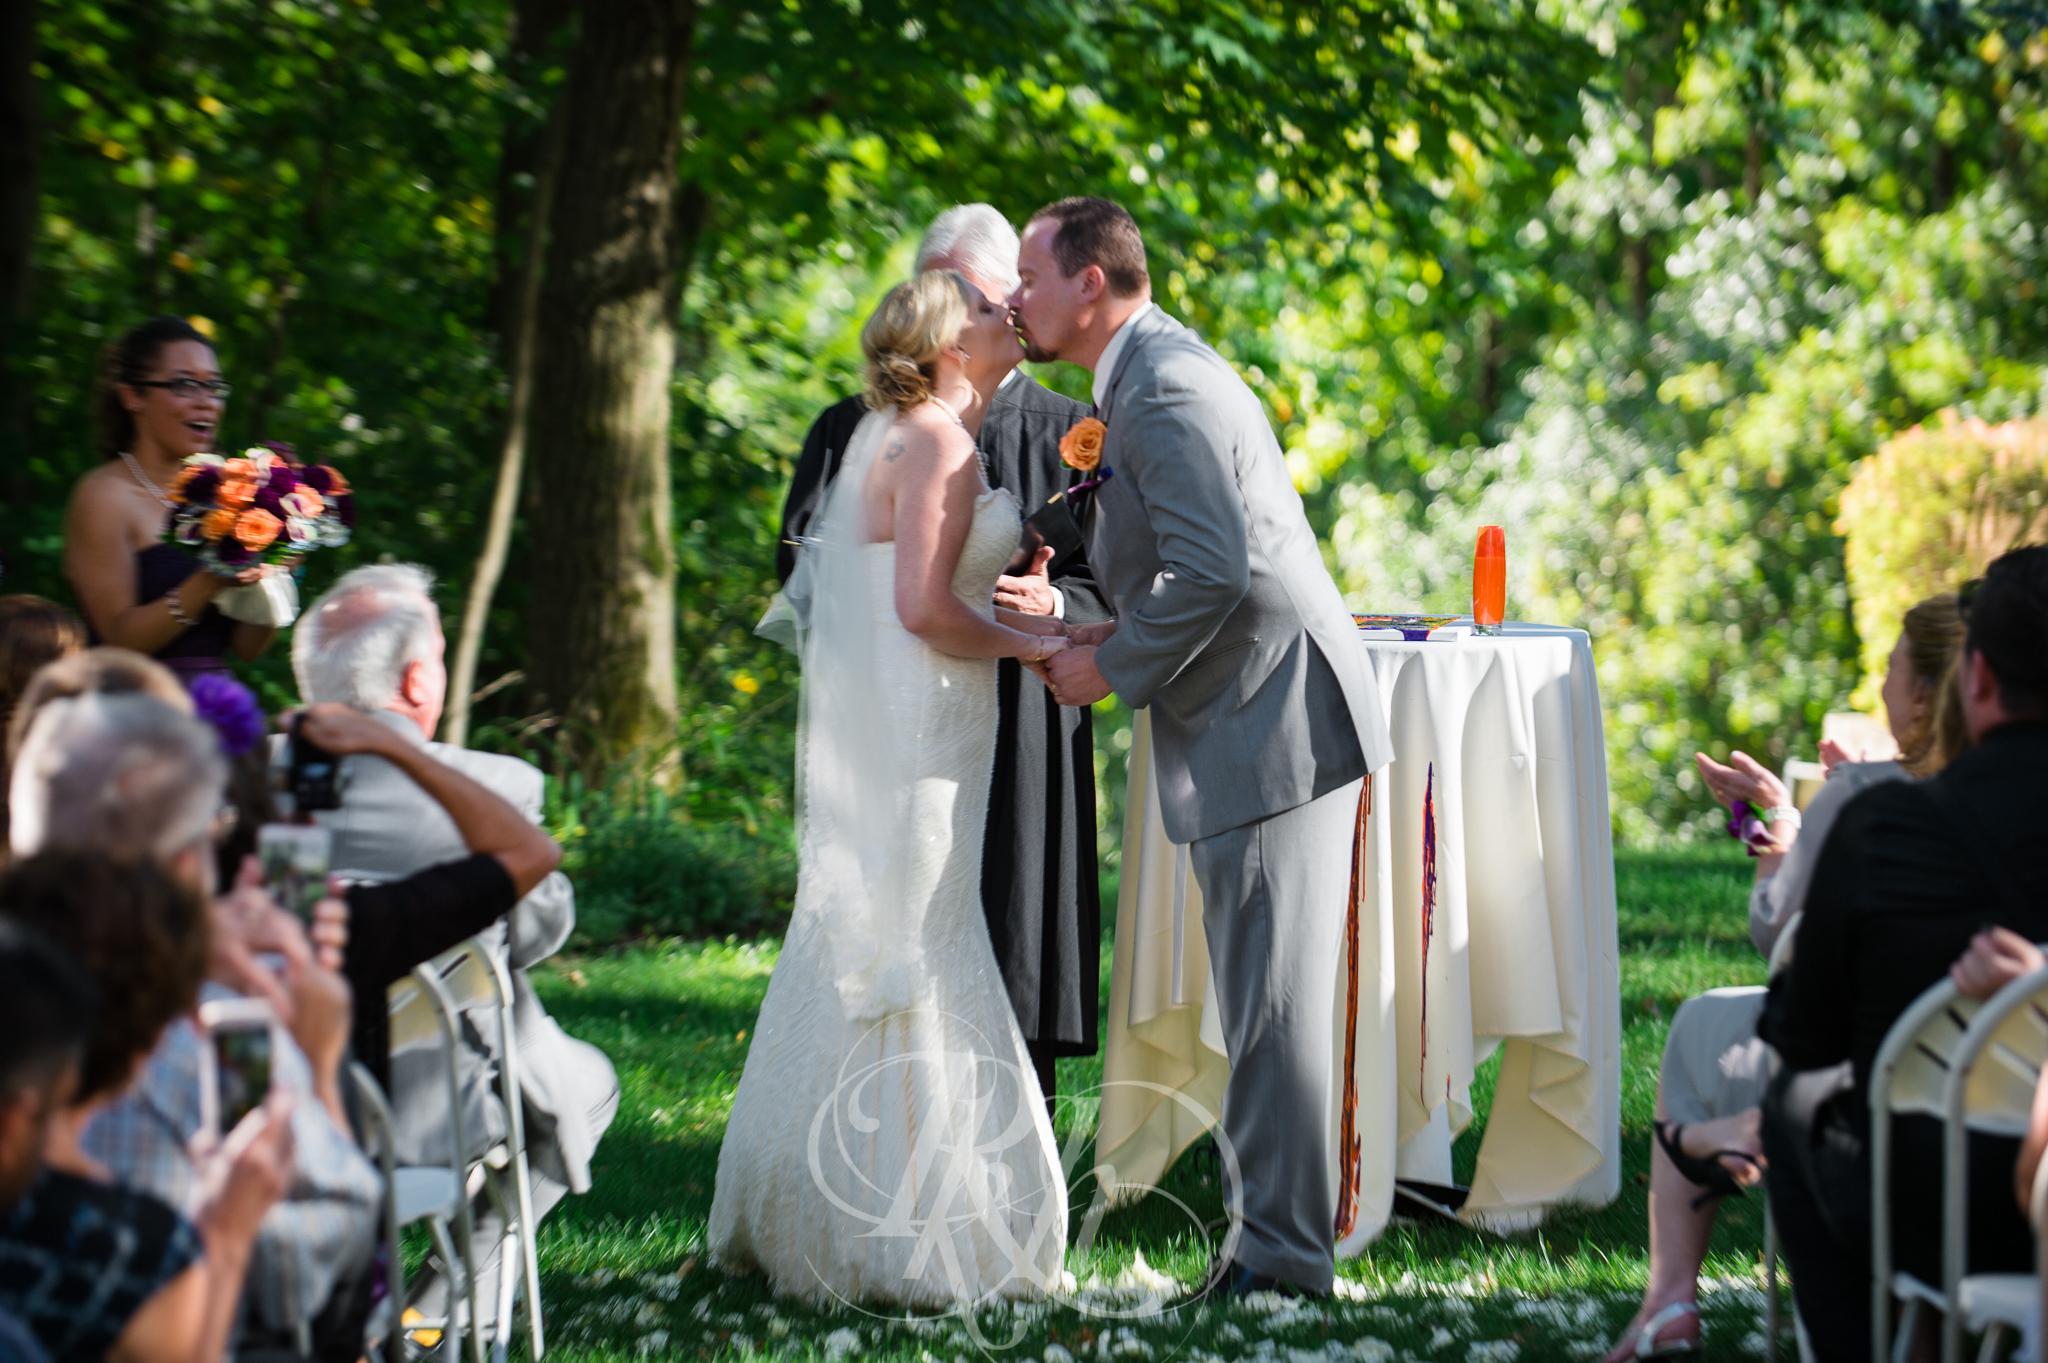 Jackie & Corey - Minnesota Wedding Photography - RKH Images -15.jpg